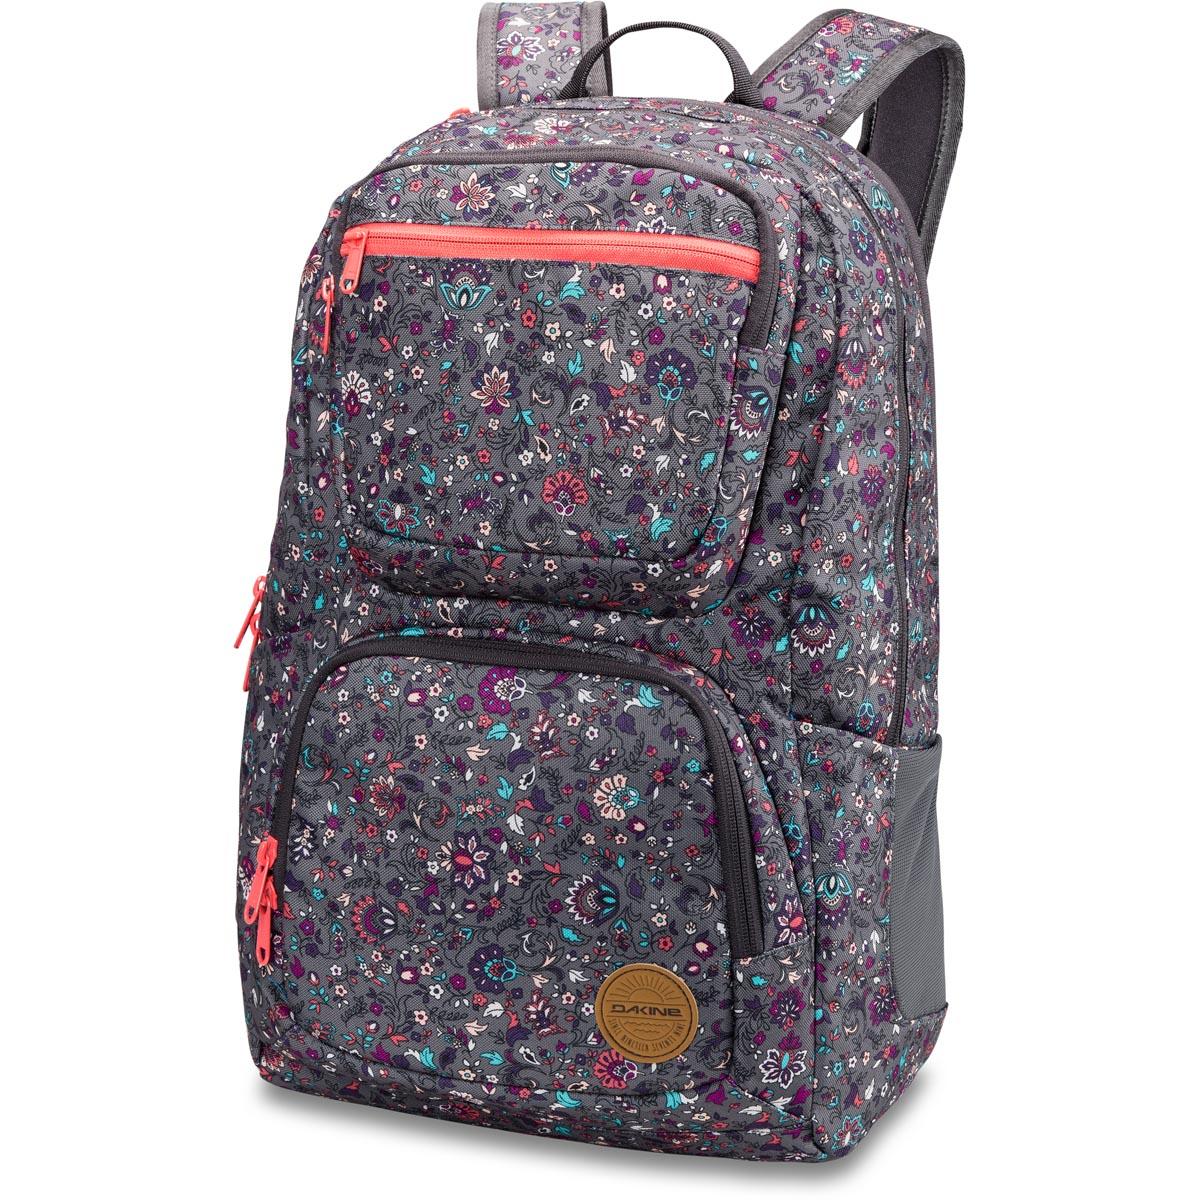 e0b280fcf96a0 Dakine Jewel 26L Backpack Wallflower II